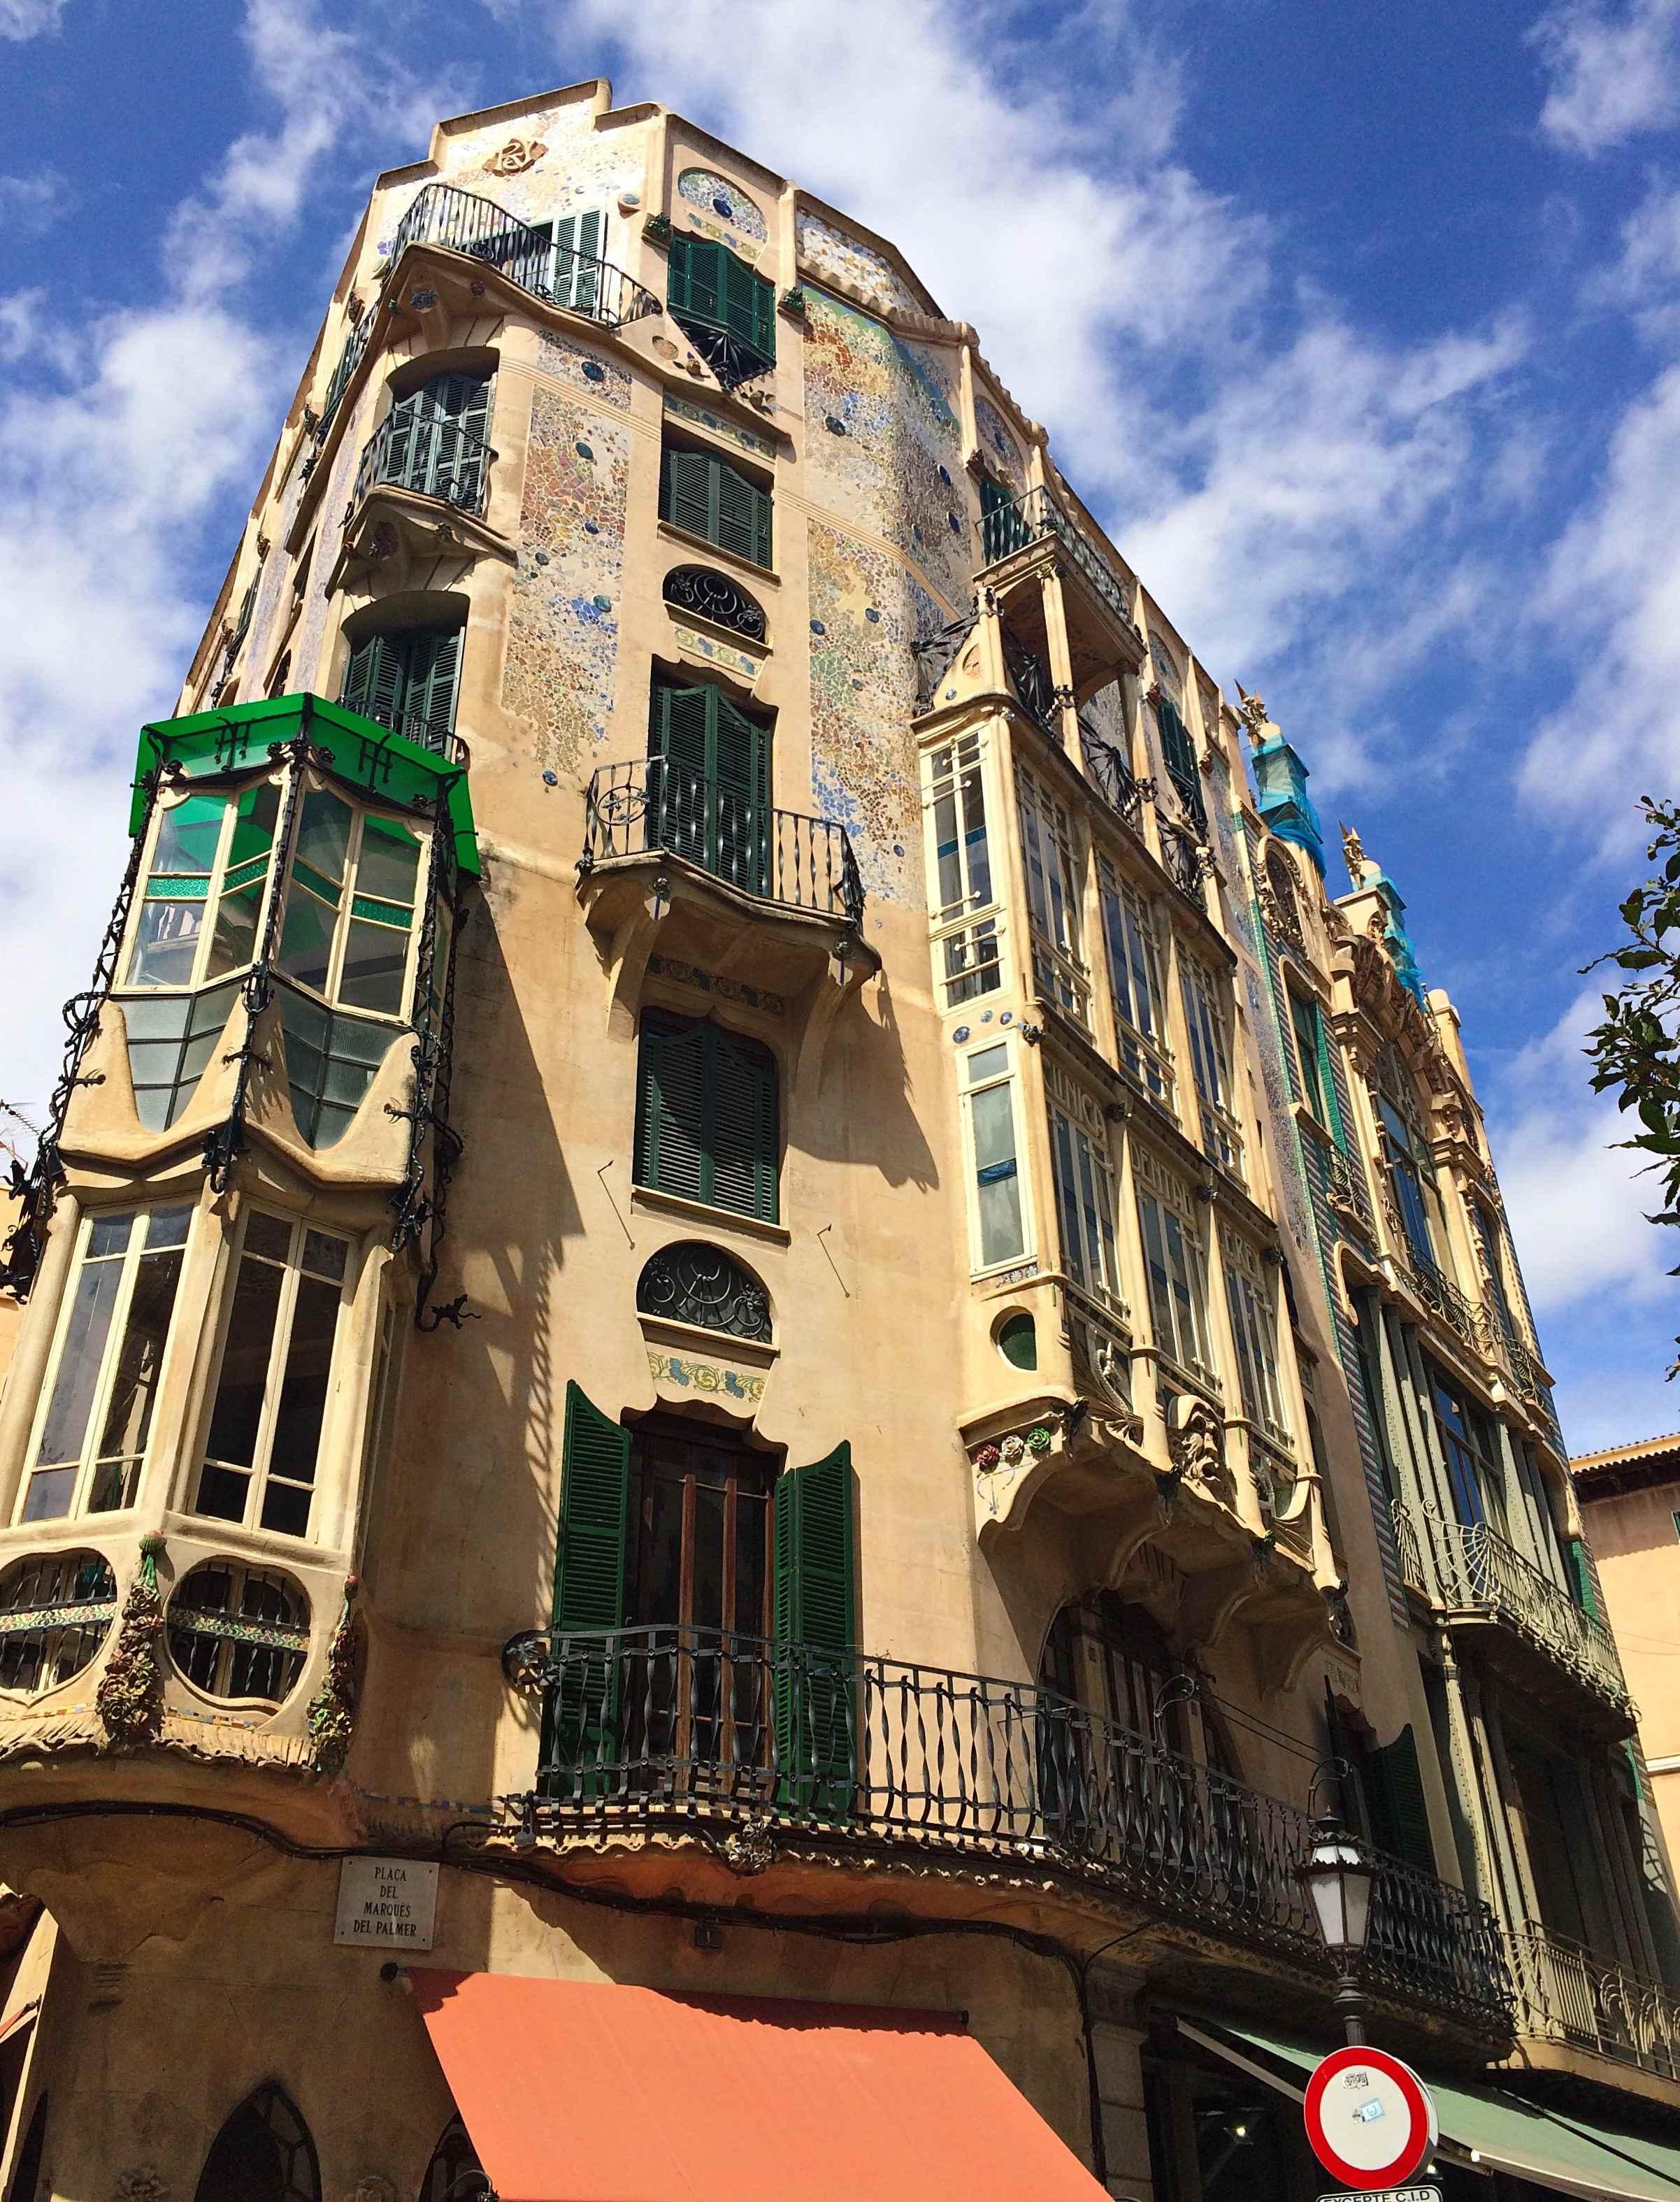 Mein perfektes Mallorca Wochenende staedtereisen sonne land und leute mallorca familie europa  tui berlin mallorca altstadt